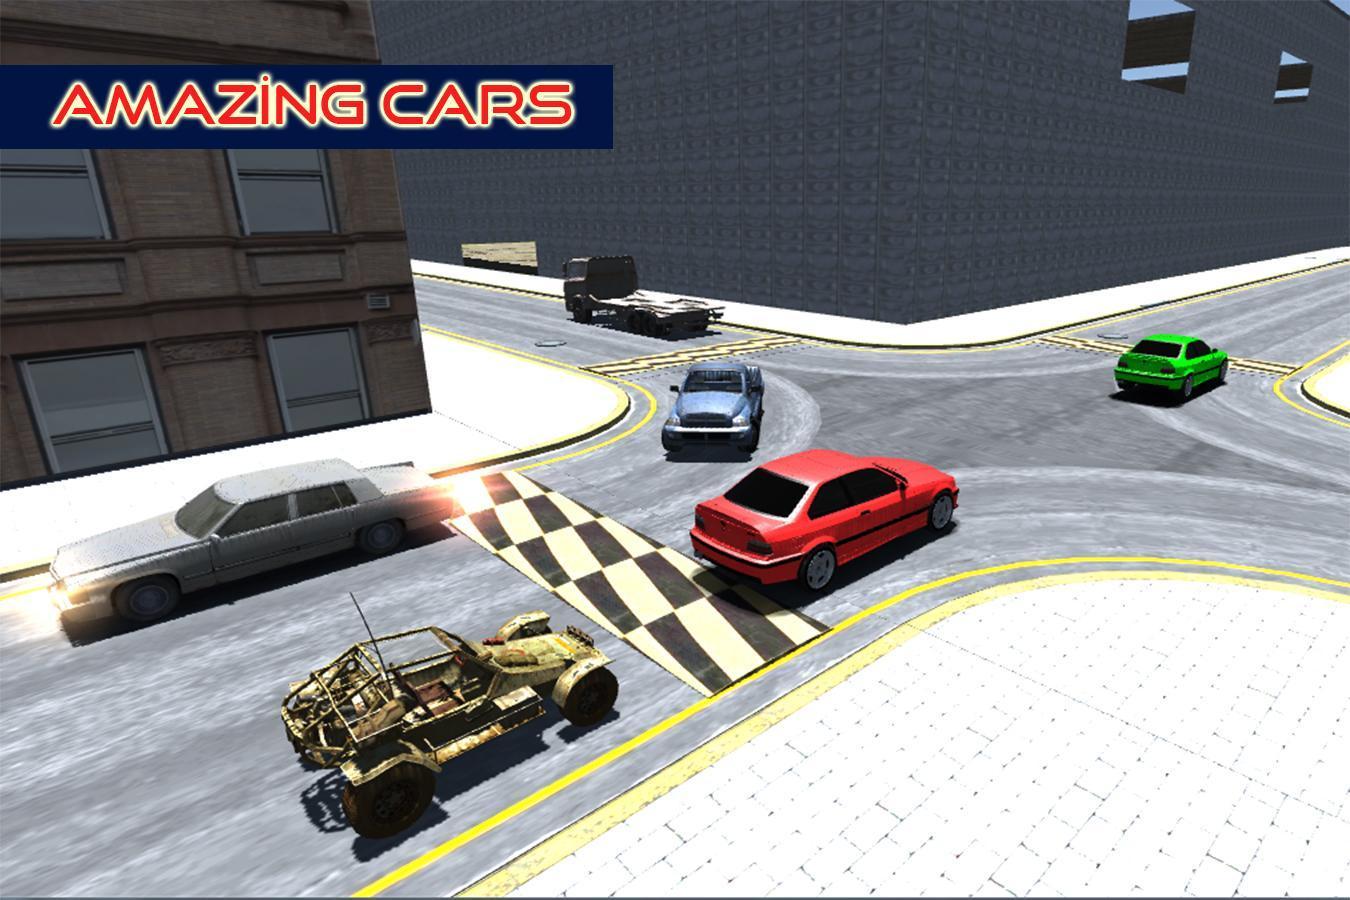 E36 Driving Simulator 1 0 APK Download - Android Simulation